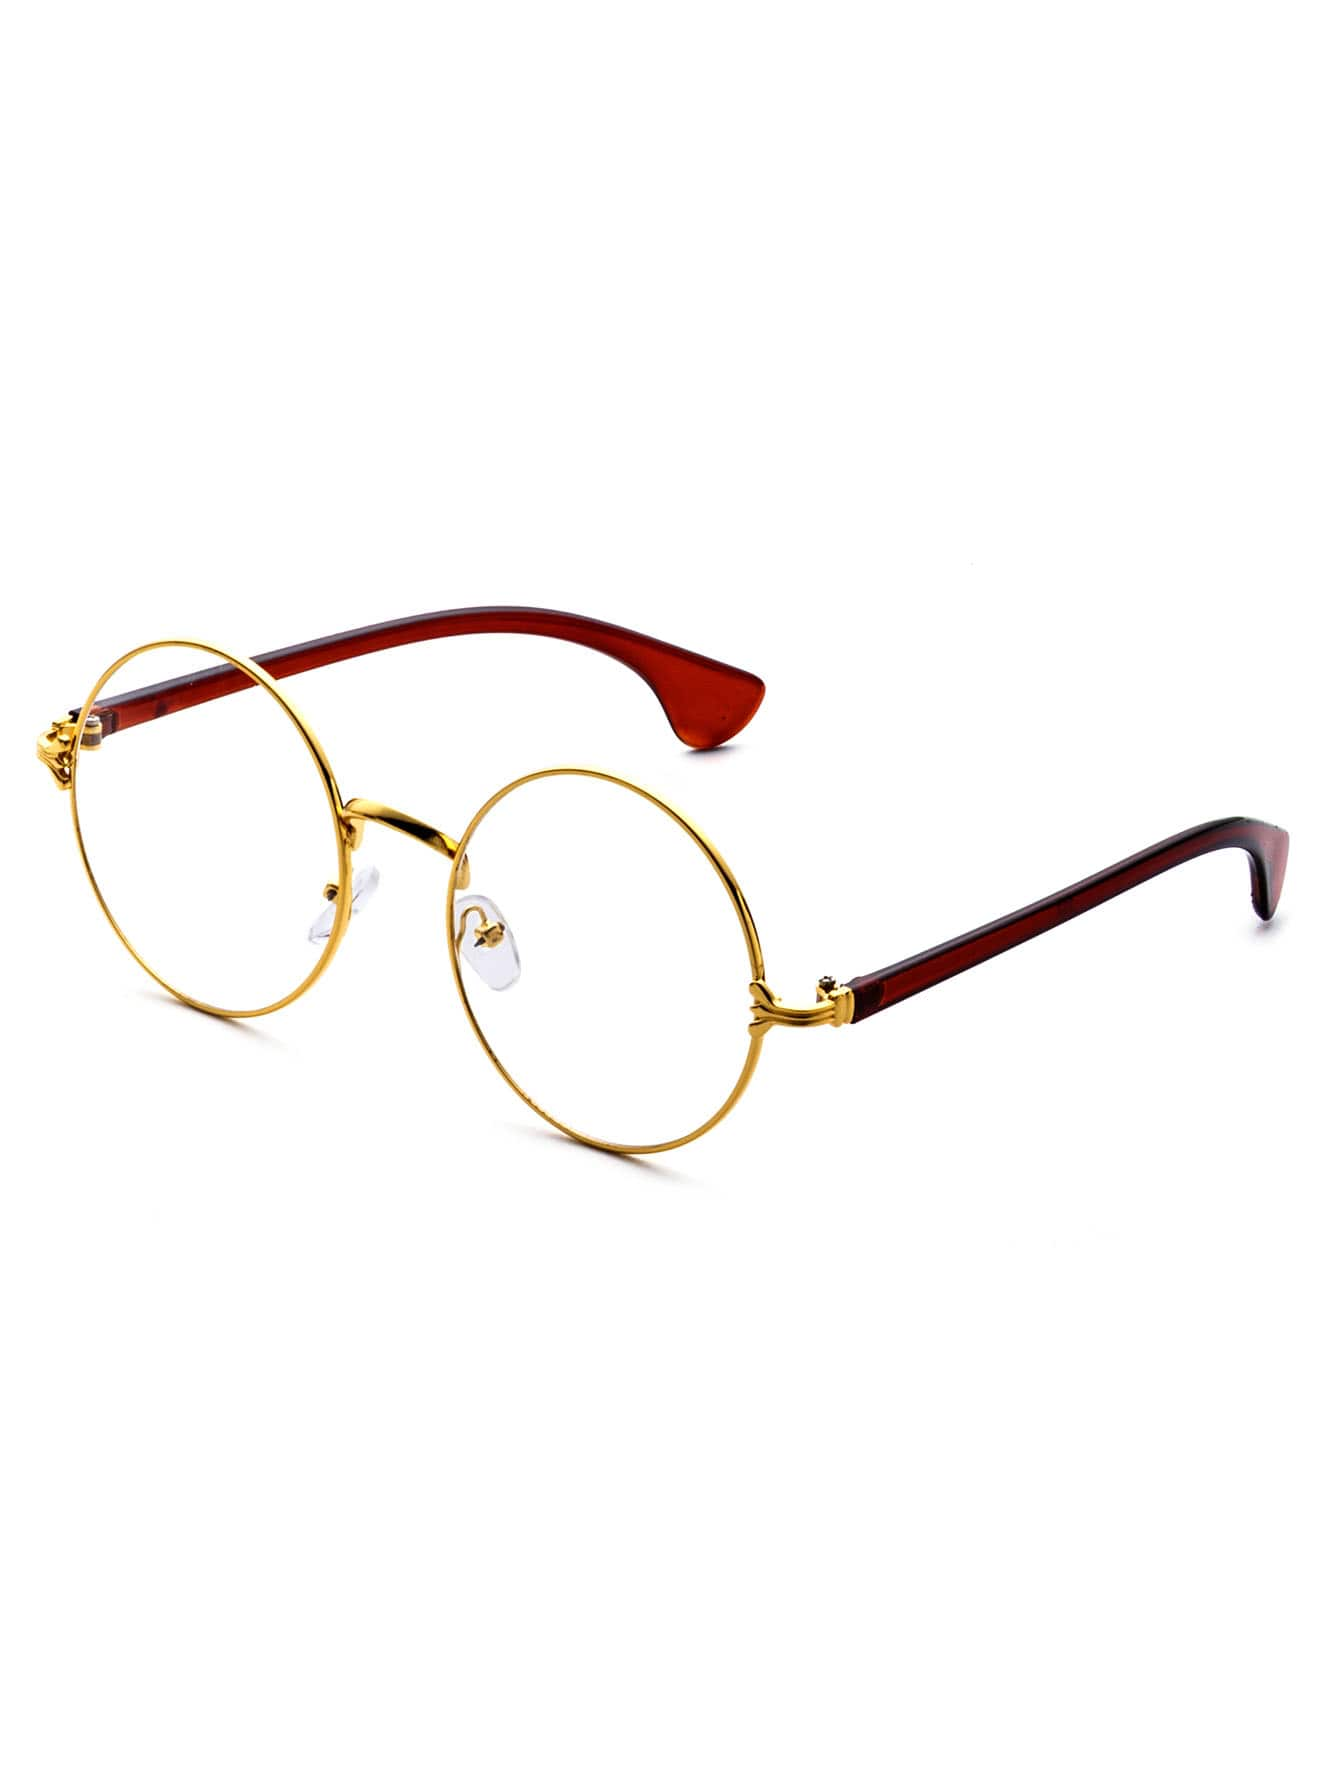 Gold Frame Contrast Arm Round Lens Glasses